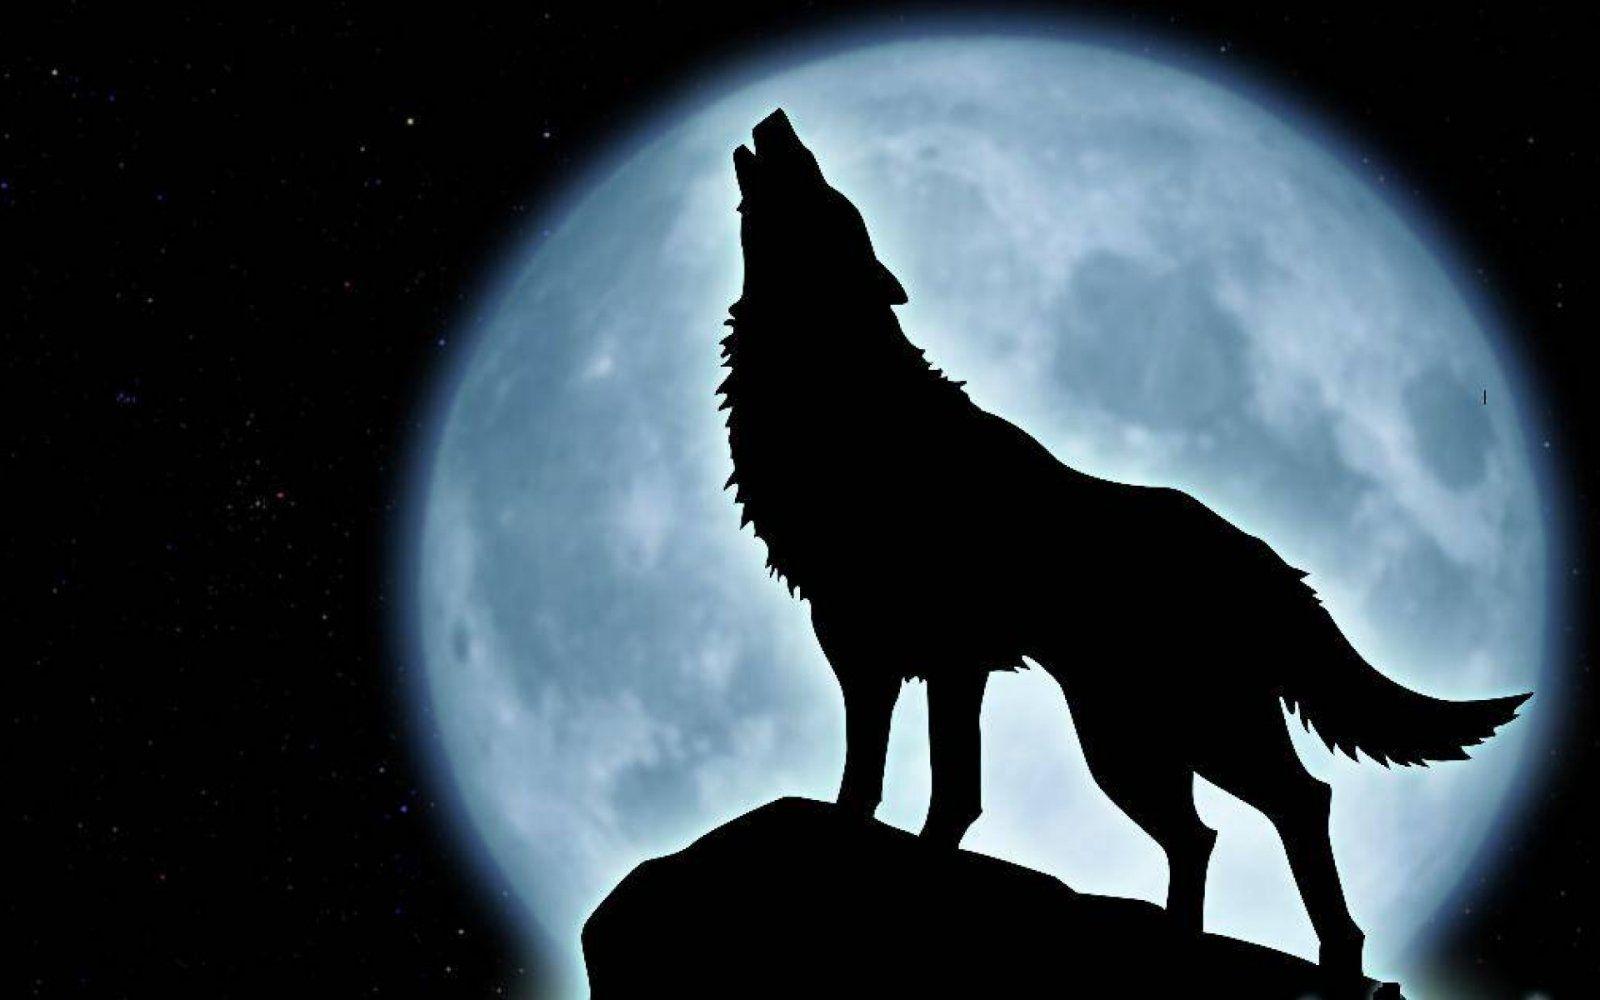 imagens de lobo - Pesquisa Google